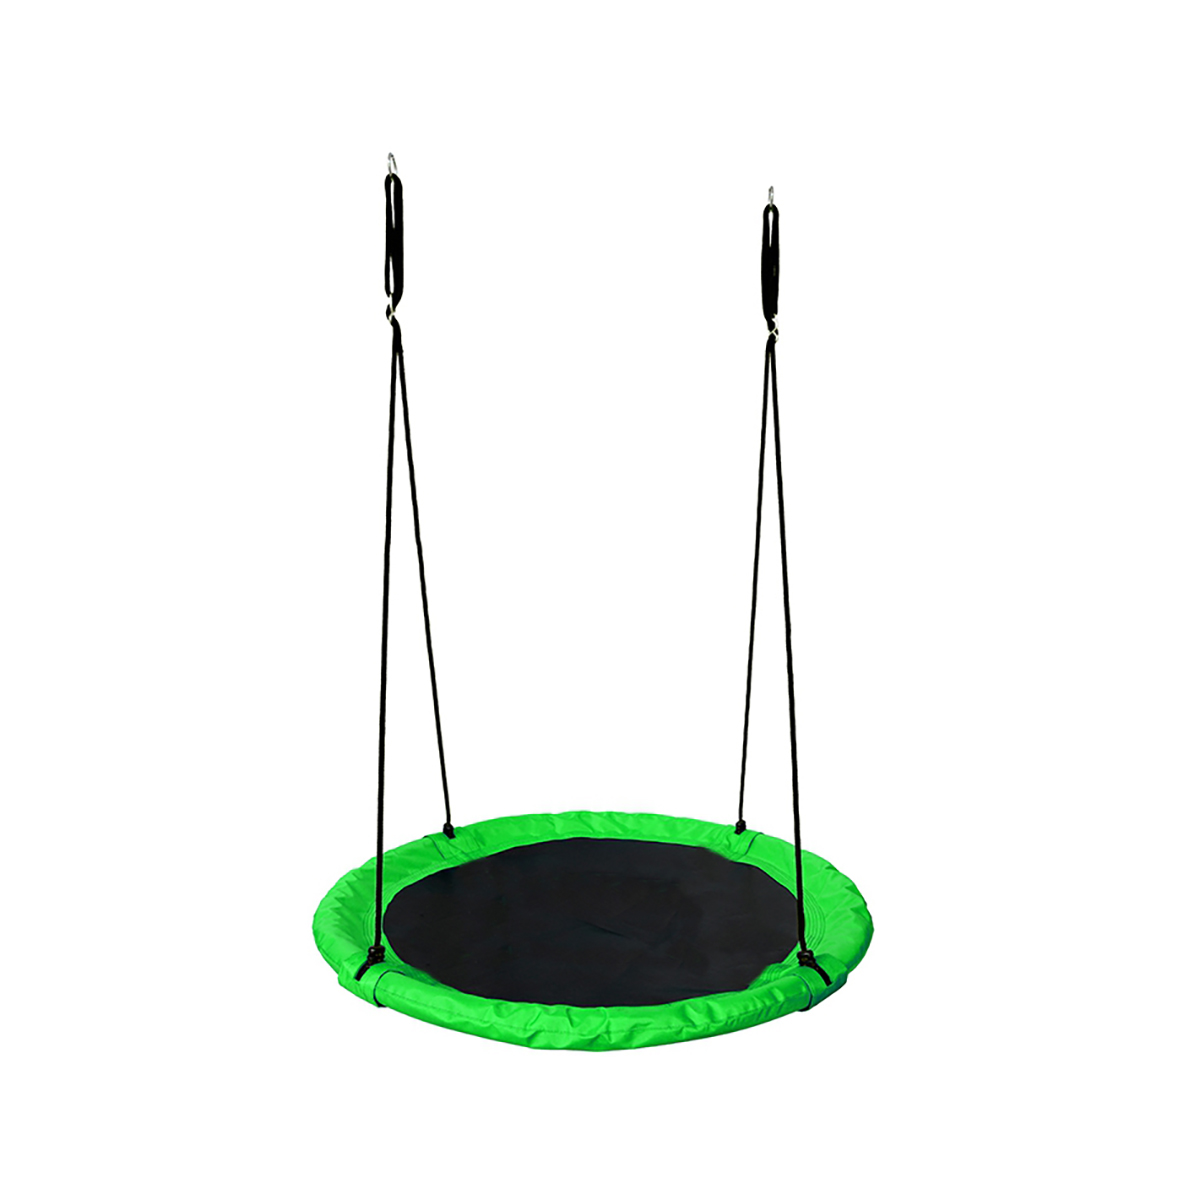 Leagan circular pentru copii King Sport, 103 cm, Verde imagine